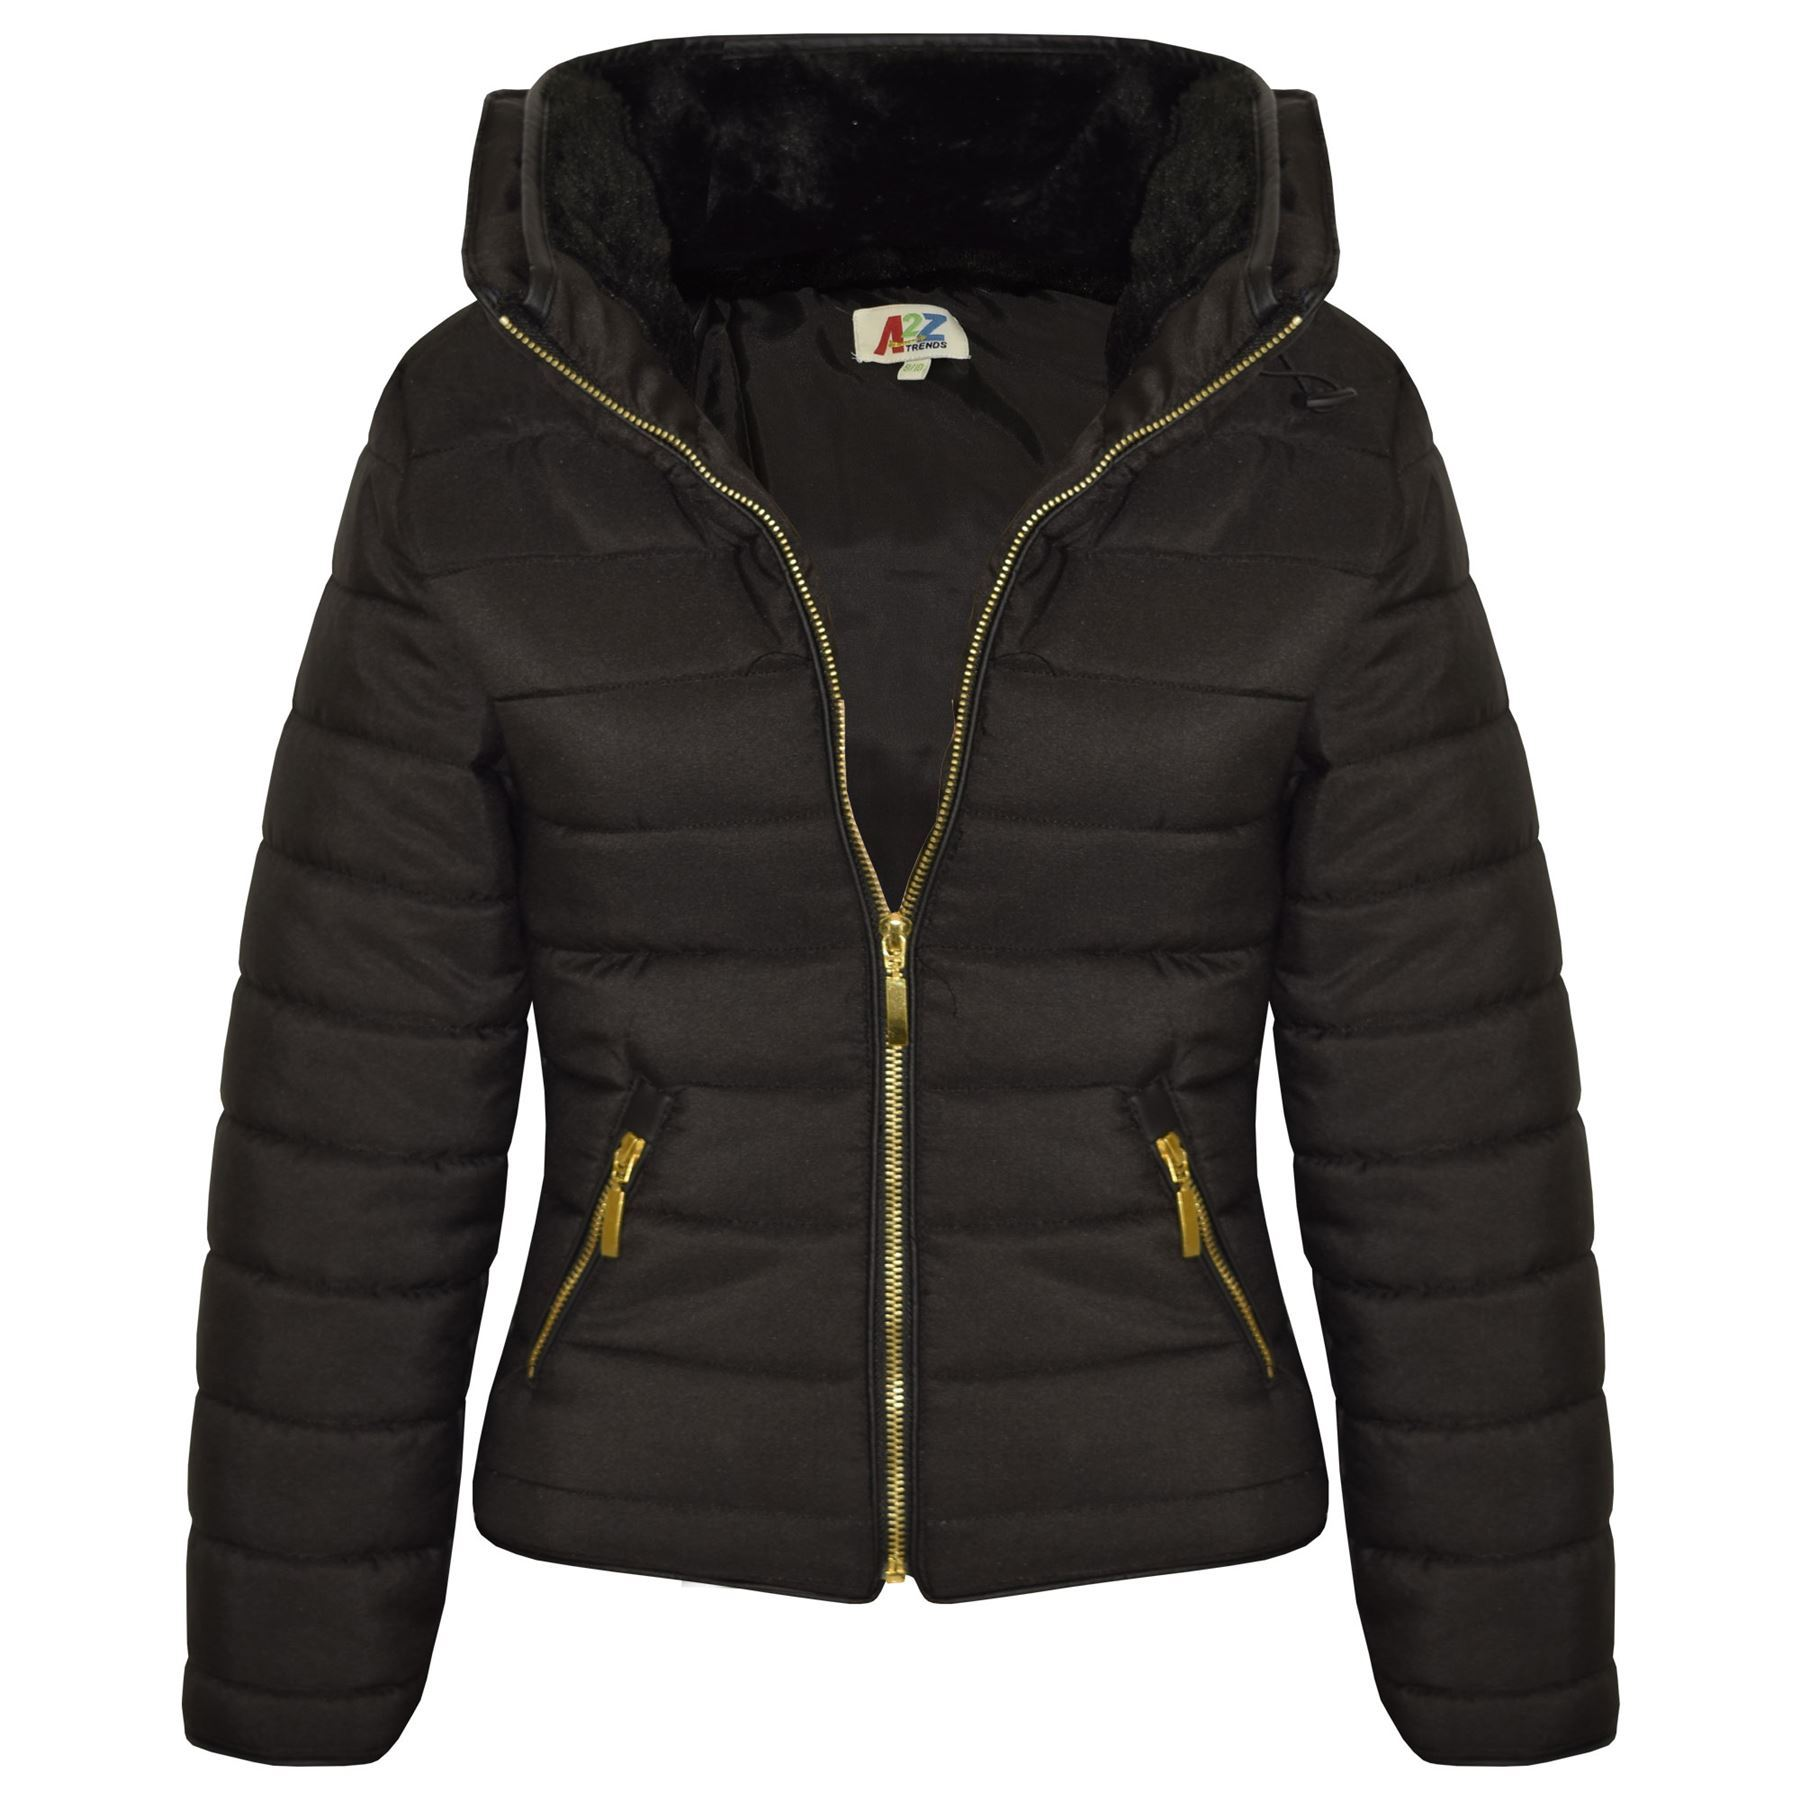 Black padded fur collar jacket